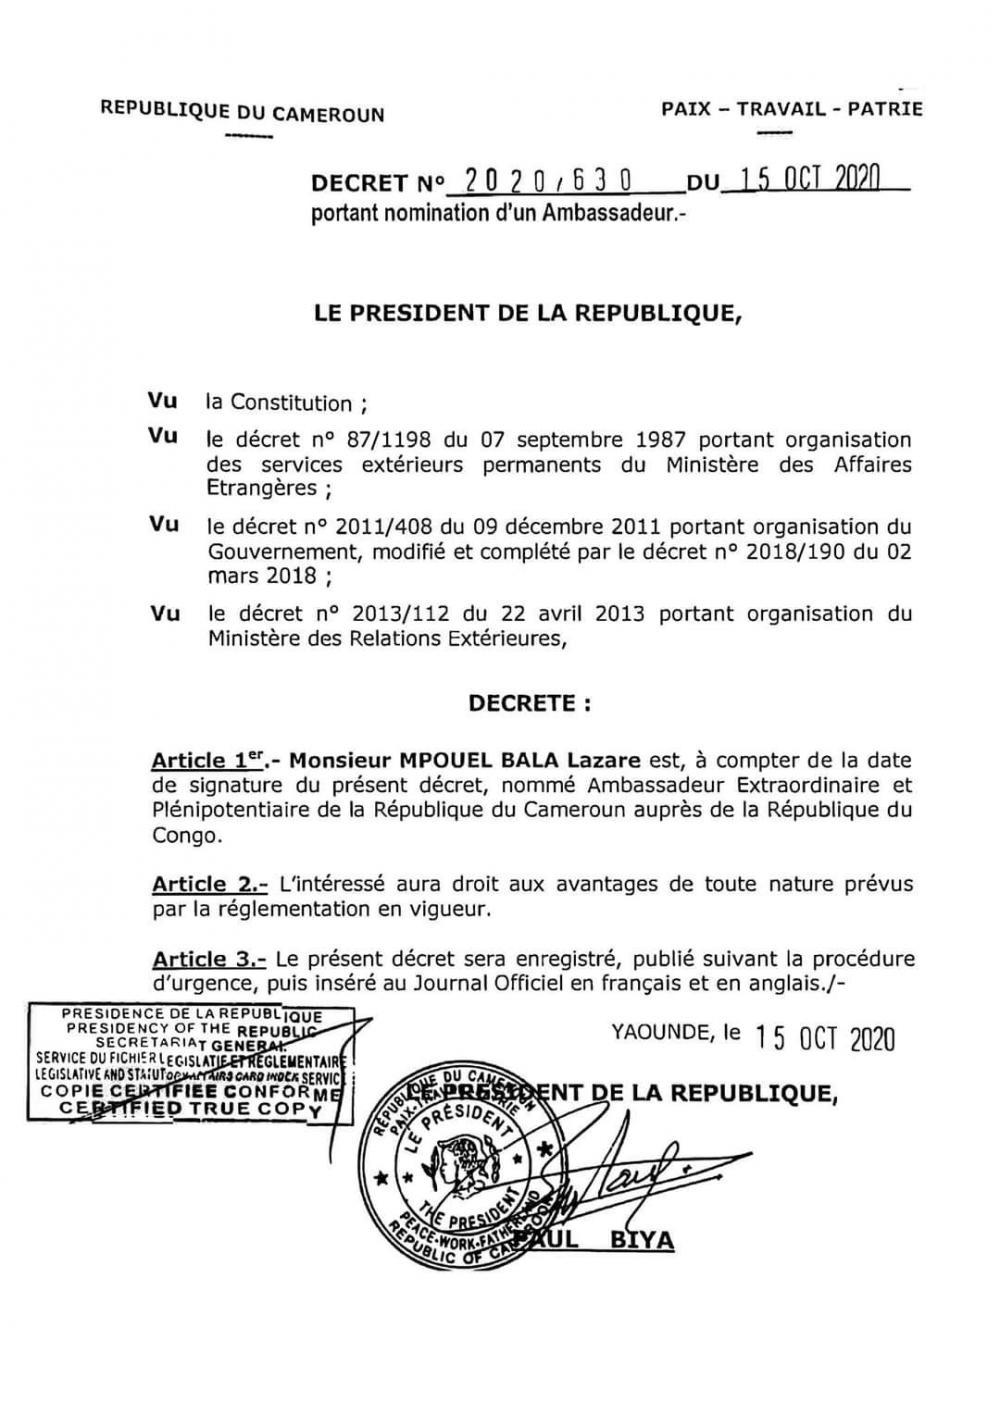 Lazare Mpouel Bala becomes New Cameroonian Ambassador to Congo